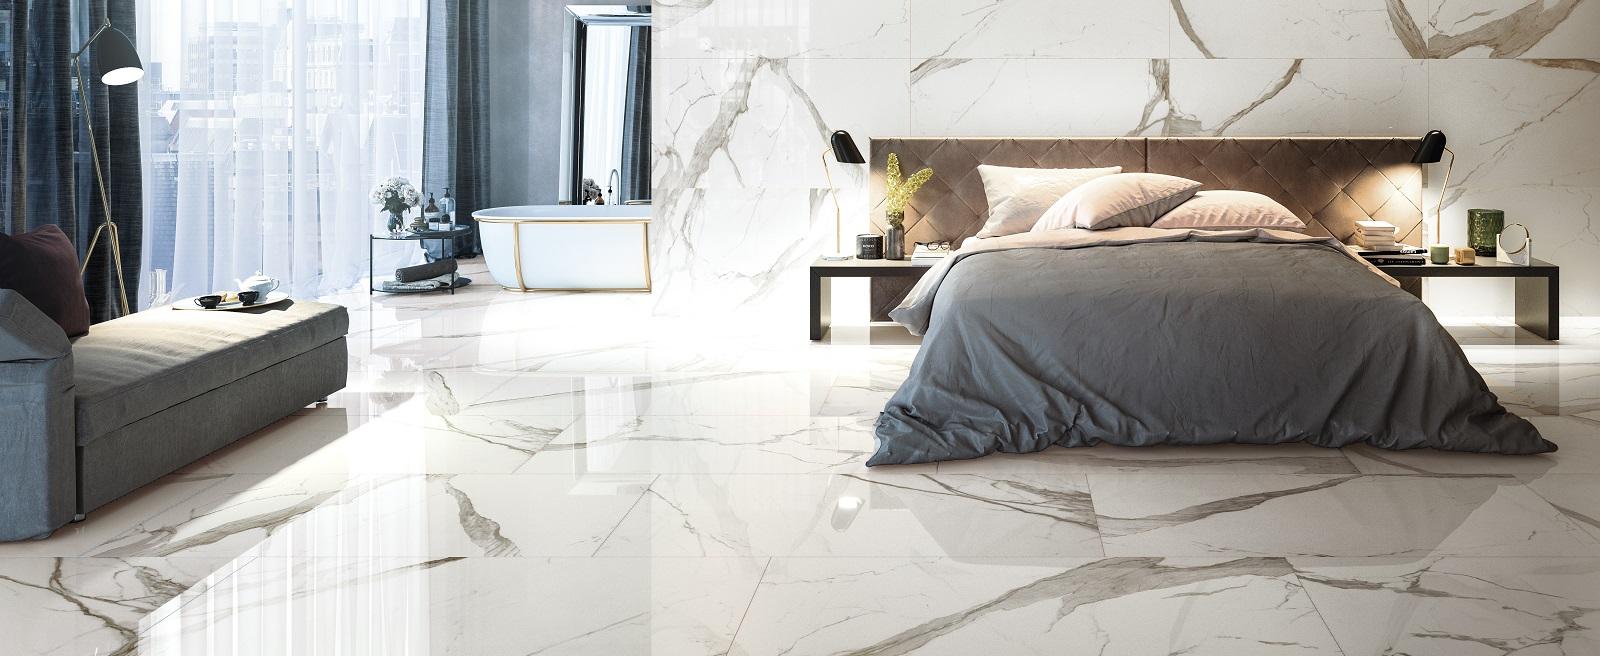 Pavimento Finto Marmo Lucido pavimento effetto marmo | prestigio